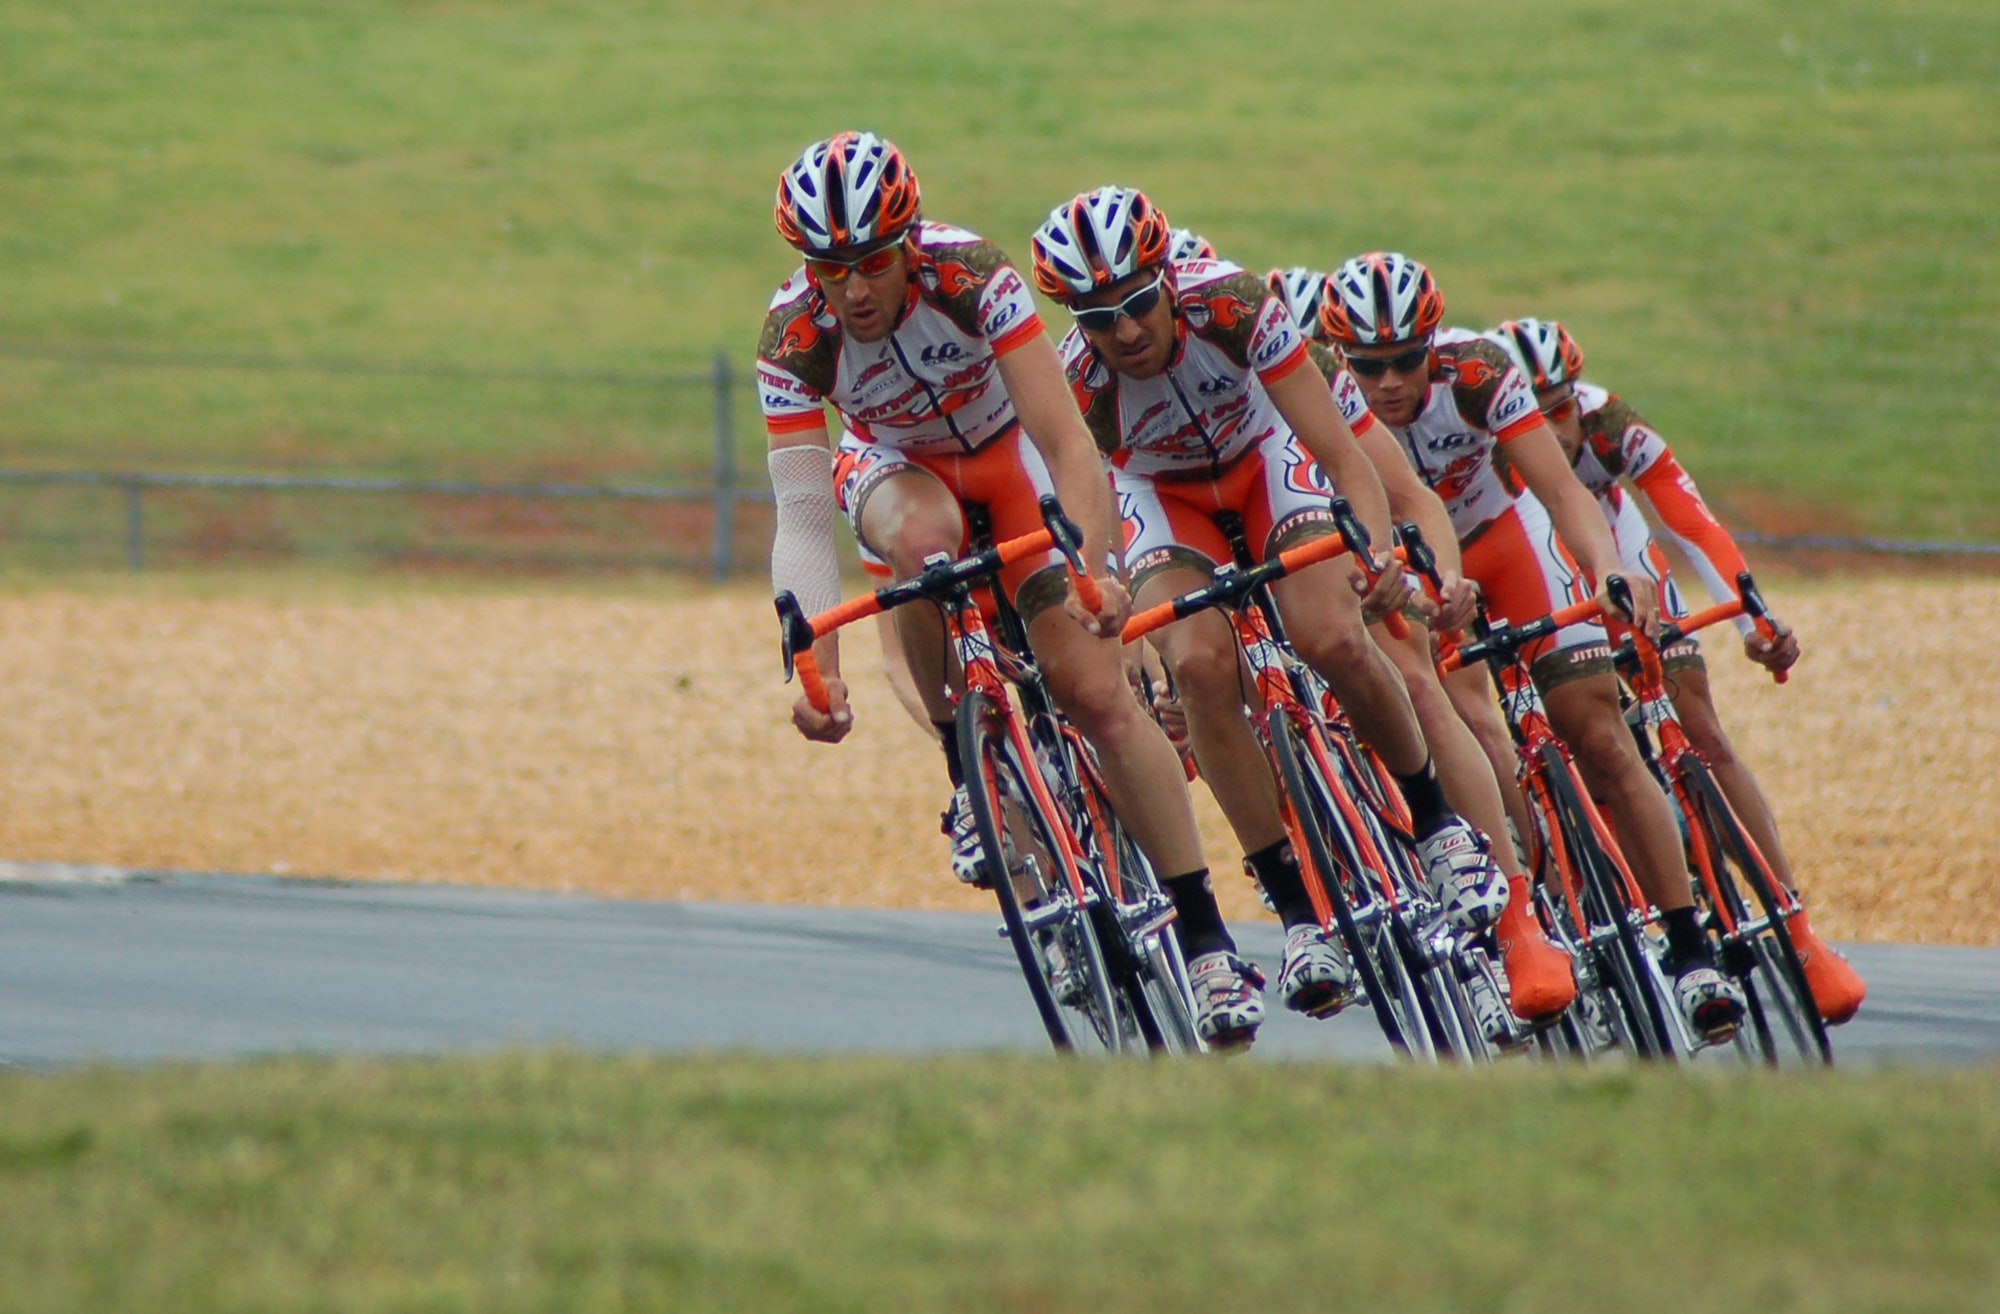 Road Atlanta cyclists